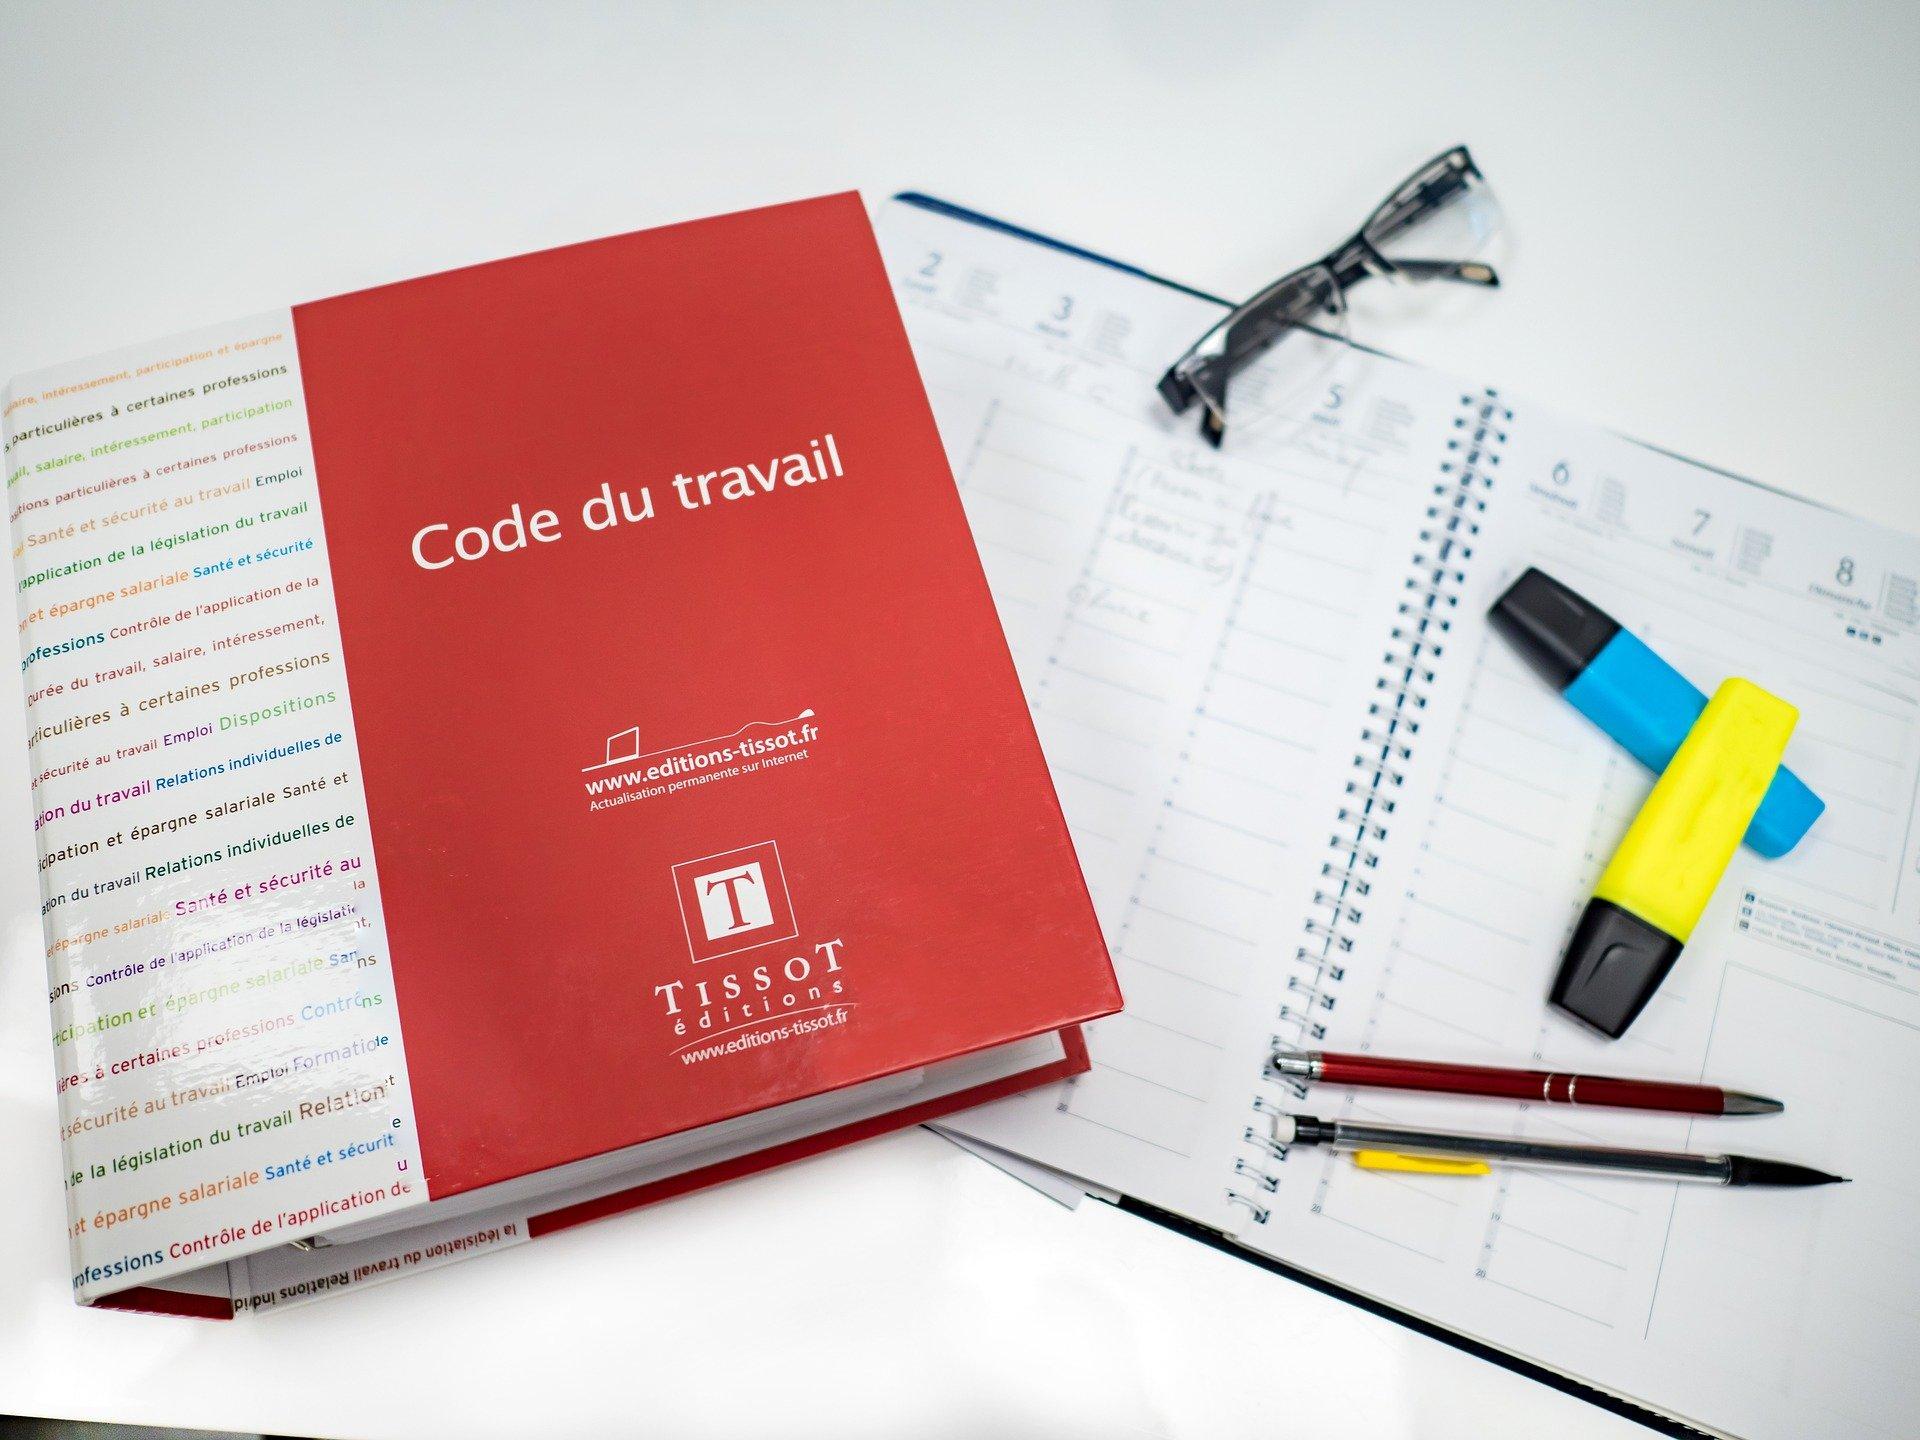 code du travail ressources humaines